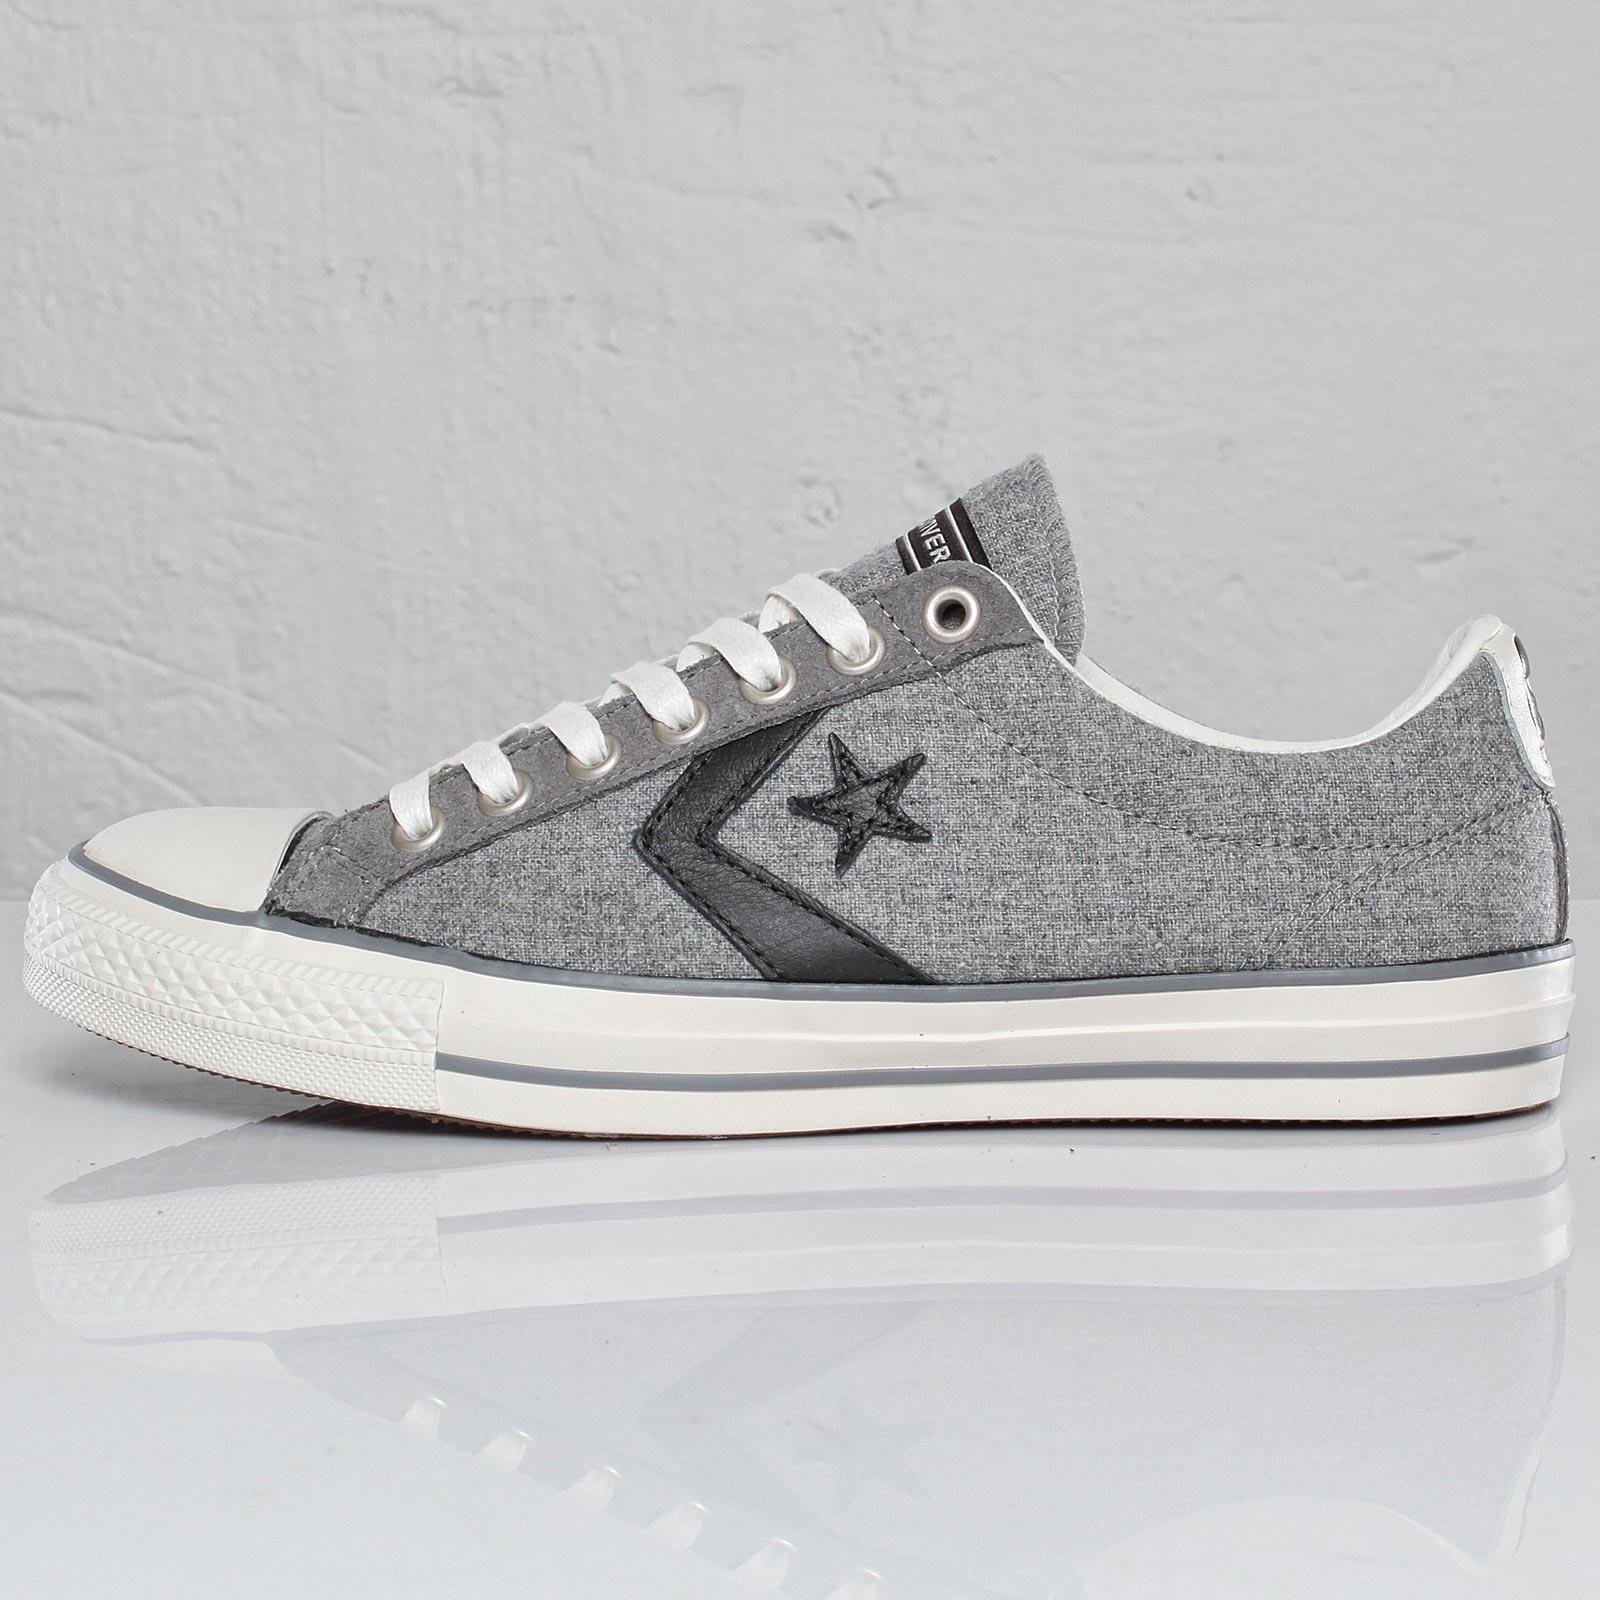 51cf6d56ea8a Converse Star Player EV Wool Ox - 101764 - Sneakersnstuff